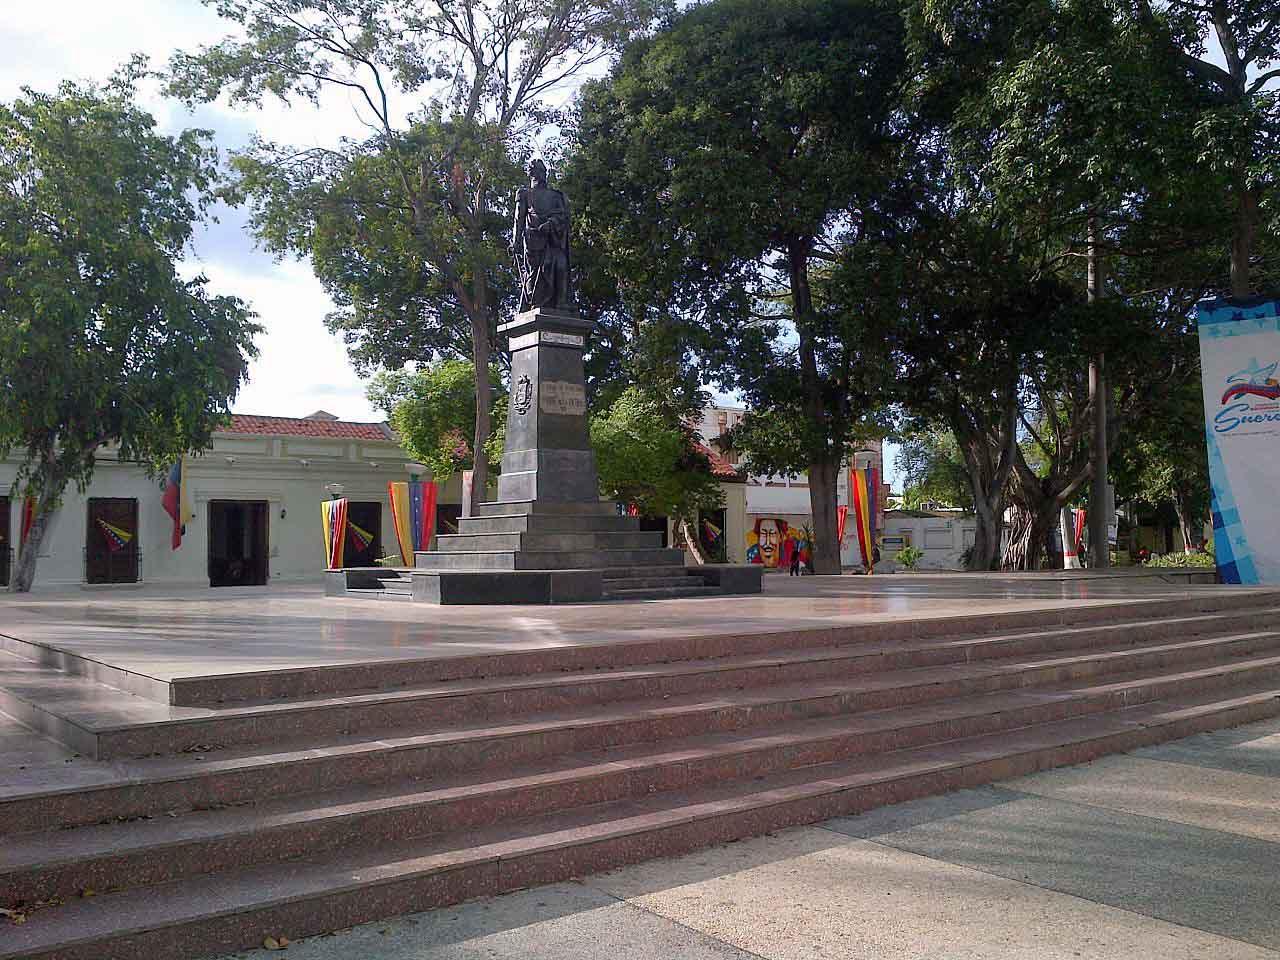 Plaza Bolívar de Cumaná, estado Sucre-Venezuela. Foto Nixón / Wikimedia Commons, 2013.